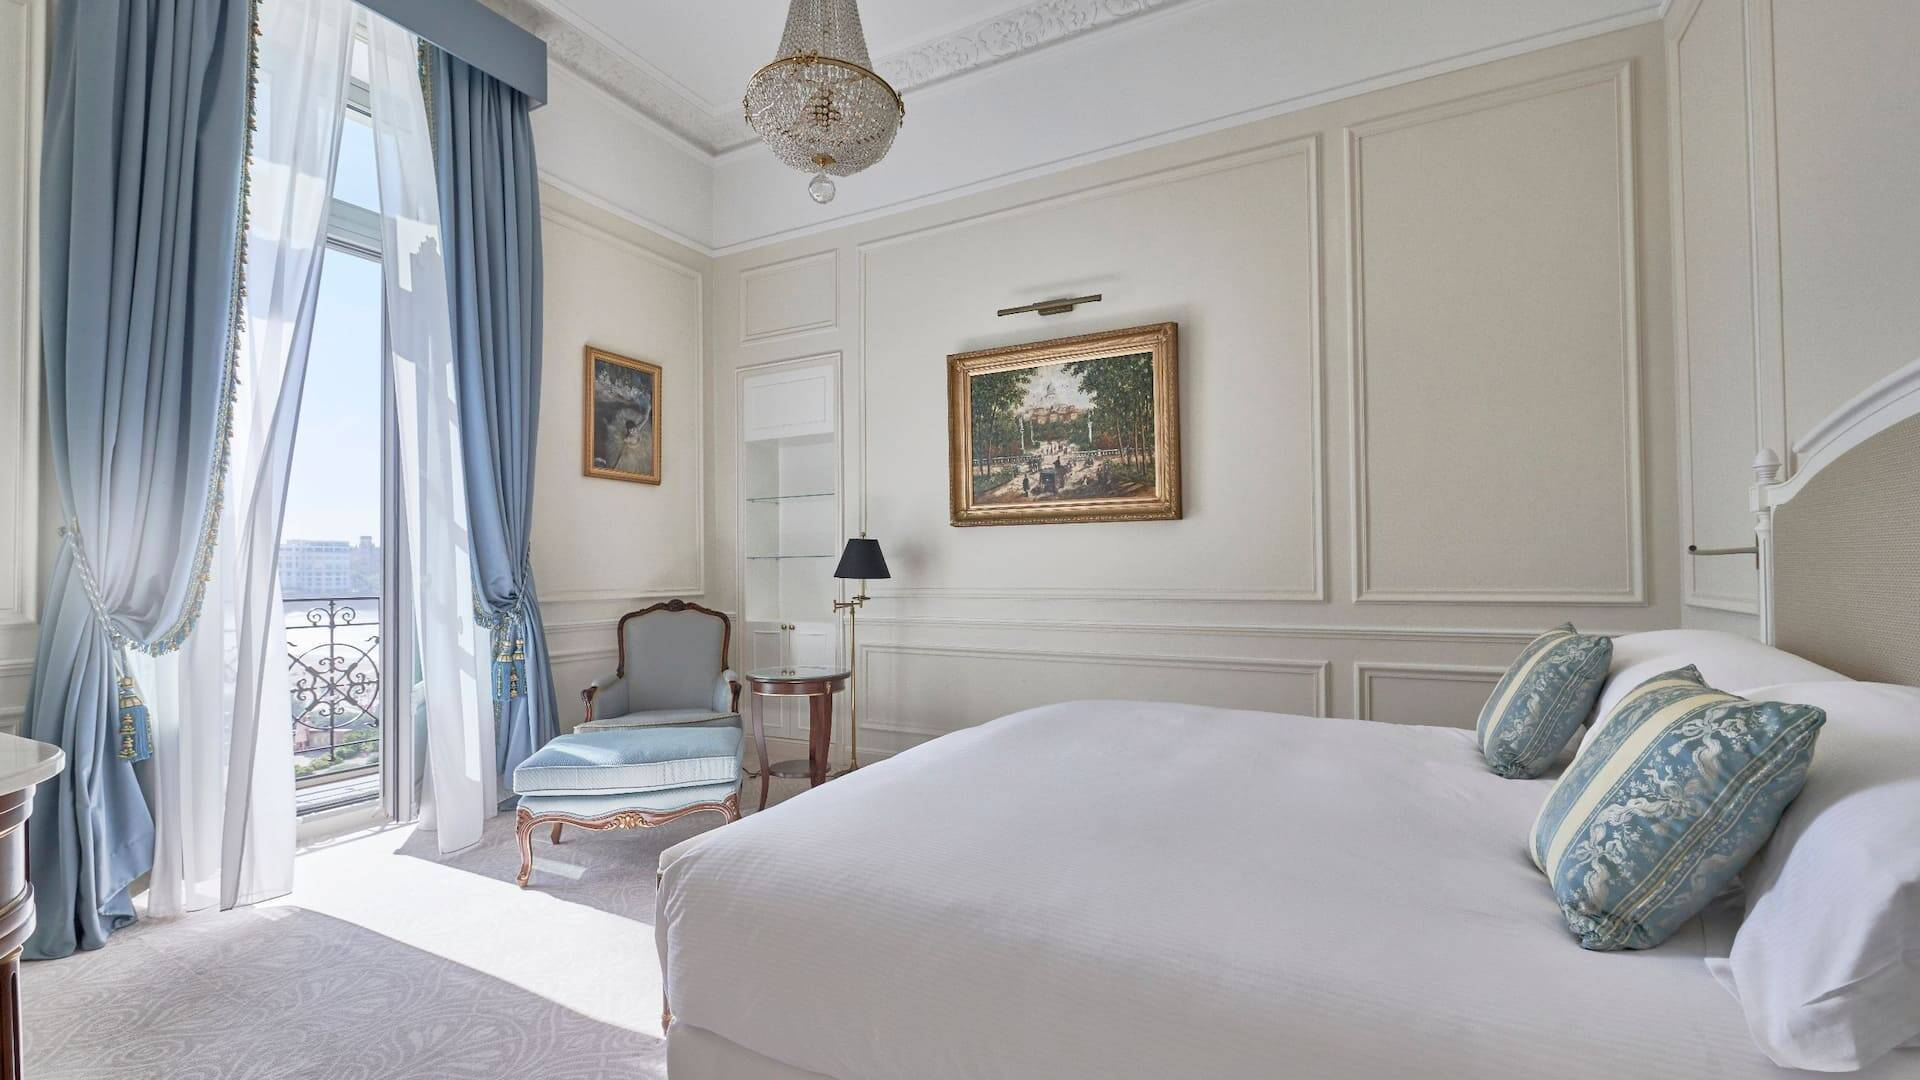 Biarritz Hotel du Palais Ambassador Suite Bedroom